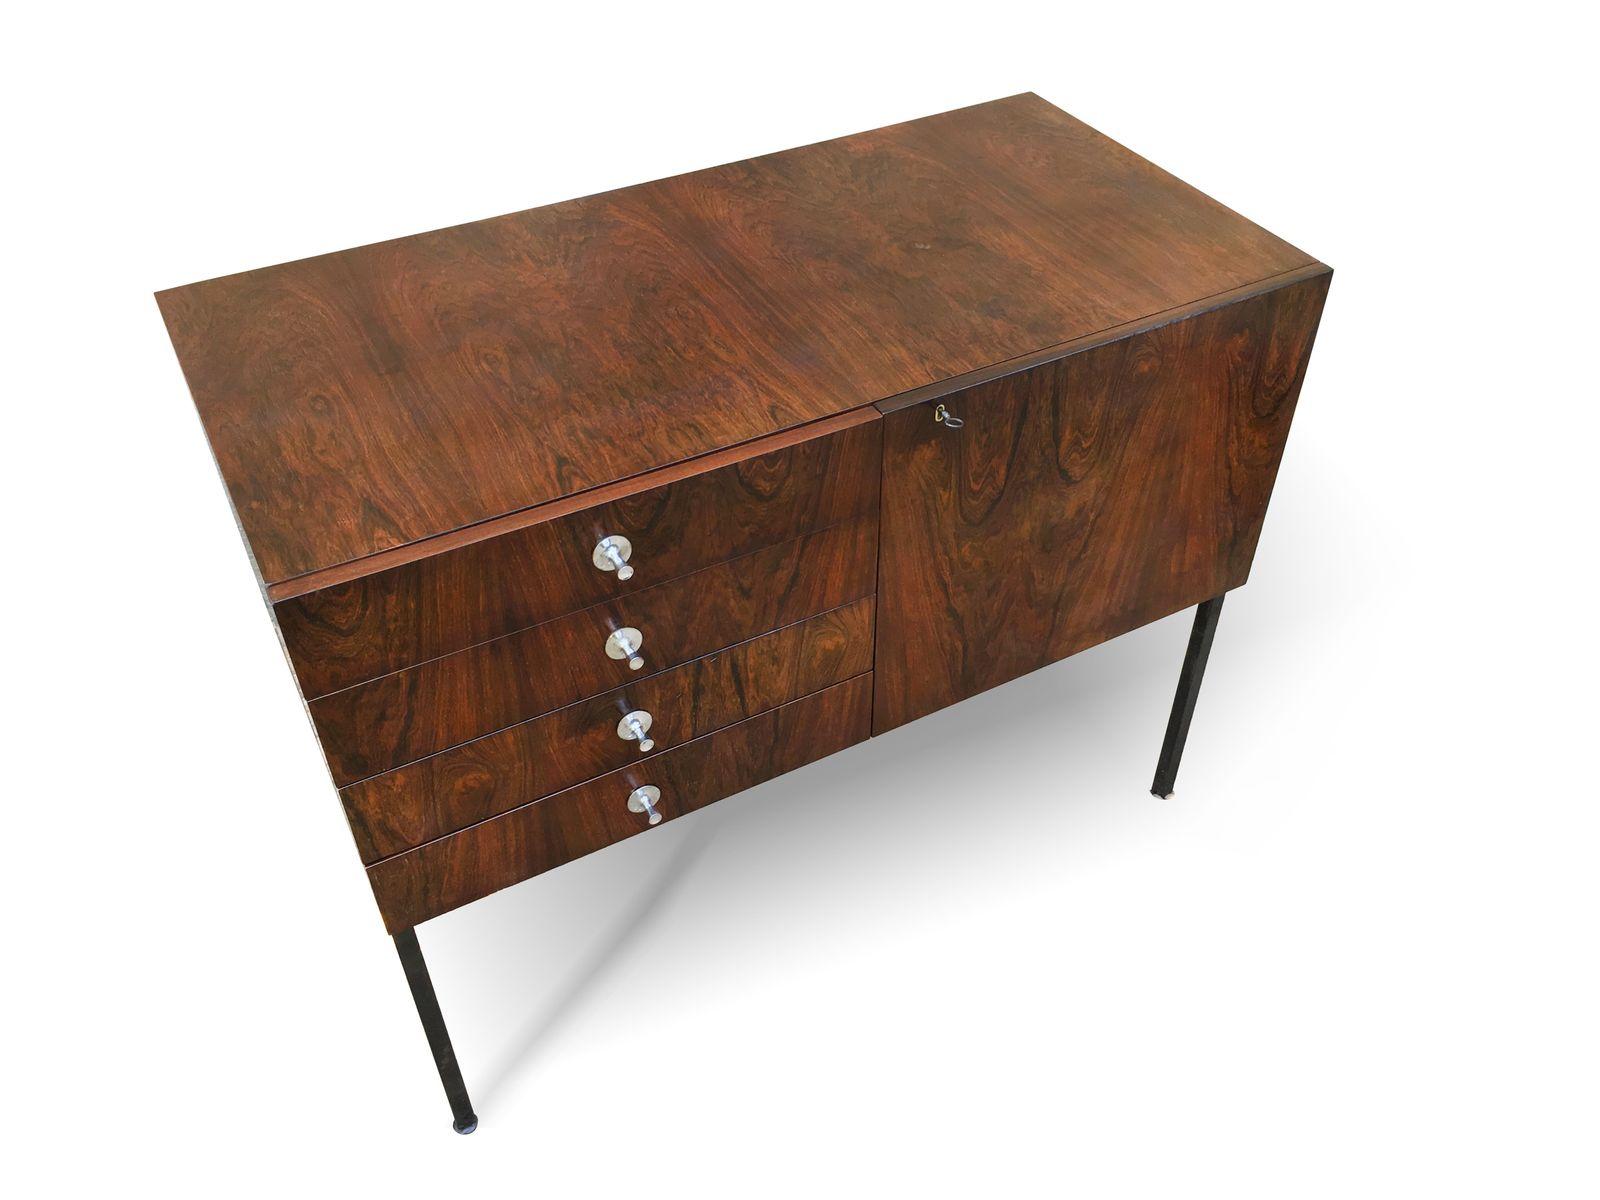 Vintage sideboard 800 by alain richard for meubles tv for for Mueble tv vintage